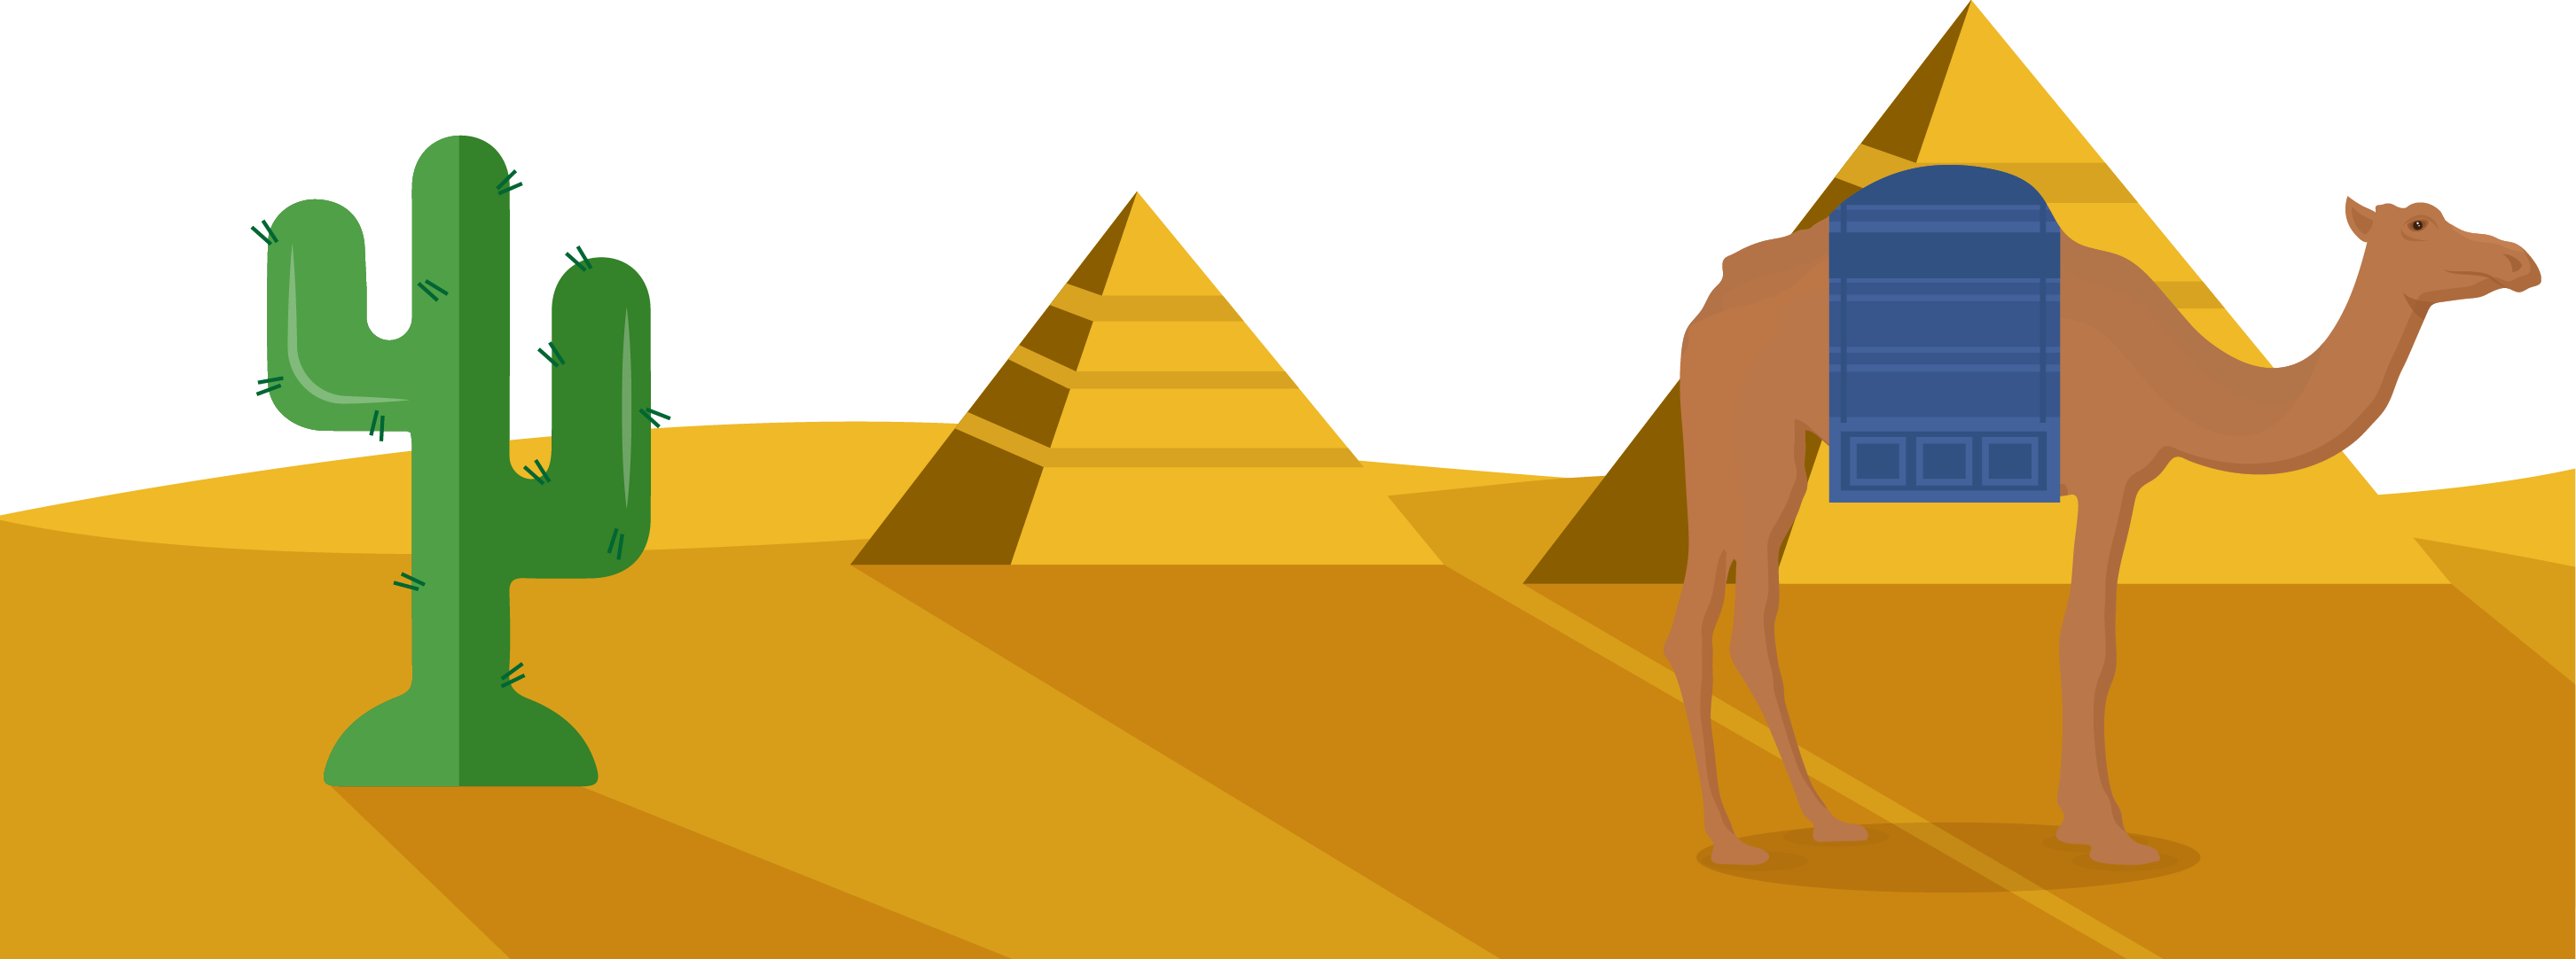 clip art royalty free library Egyptian pyramids Cartoon Drawing